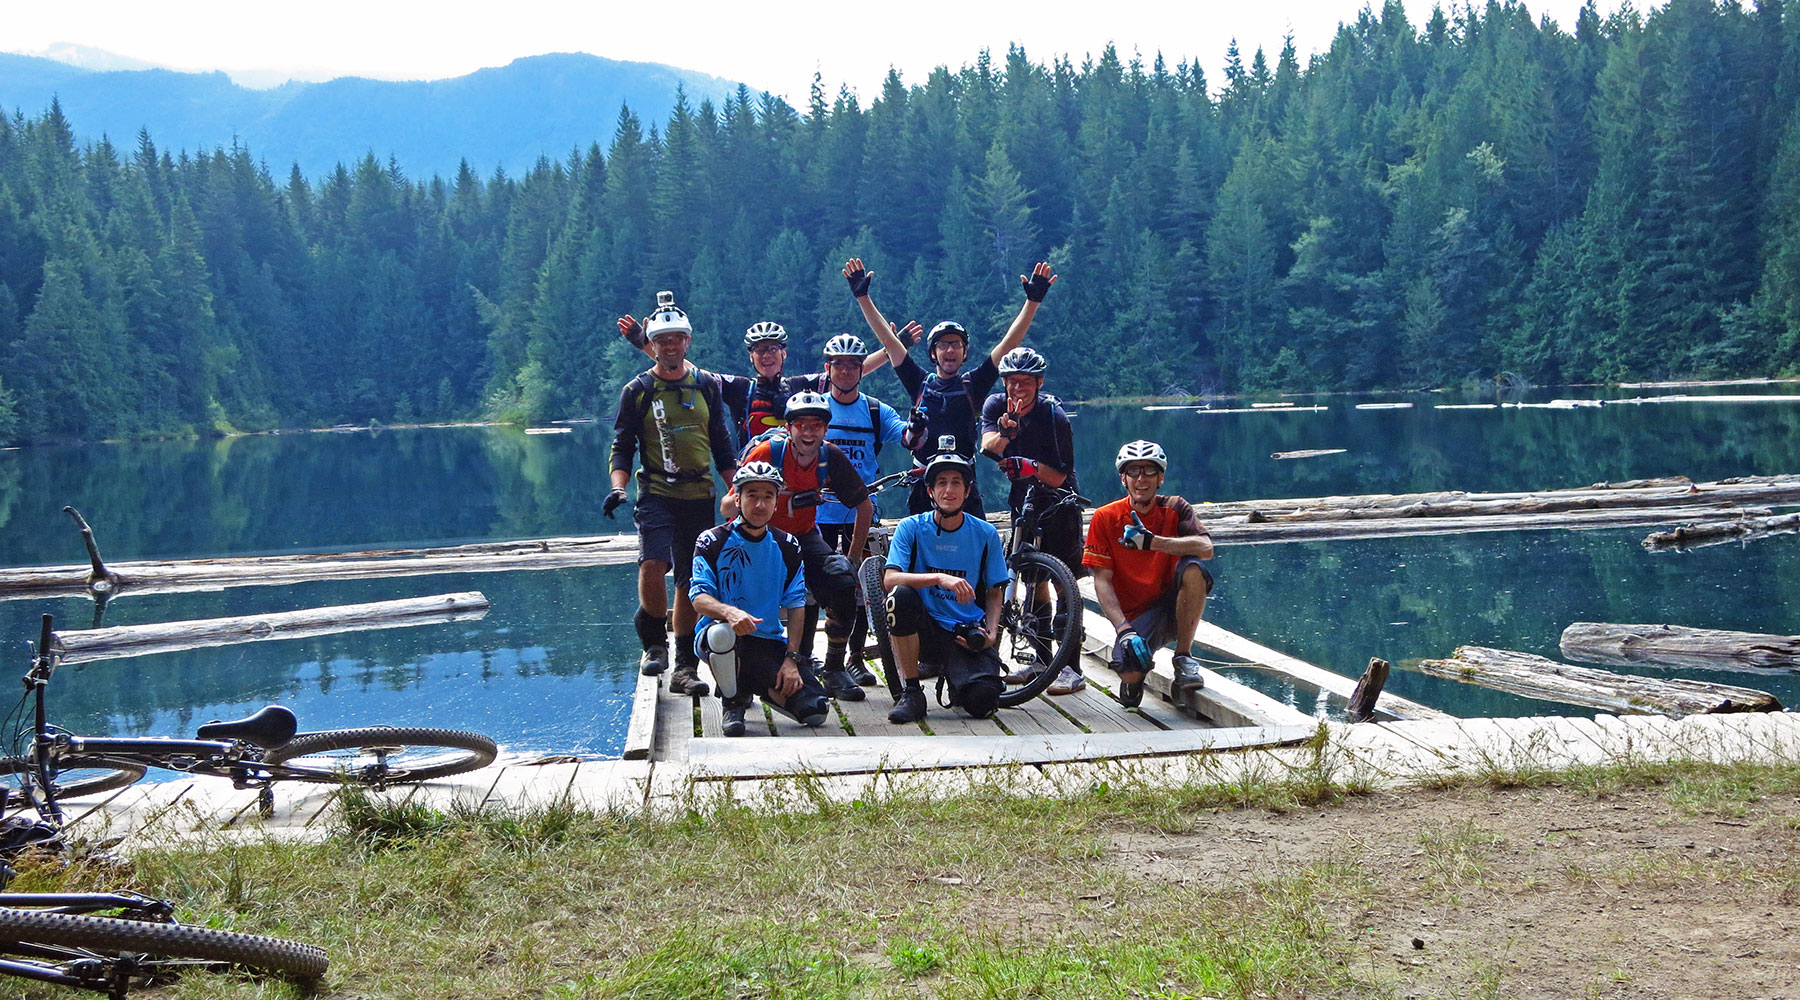 Whislter-Area-Vtt-Bear-mountain, VTT a whistler, ouest canada, chinook, voyage, aventure, vélo de montagne